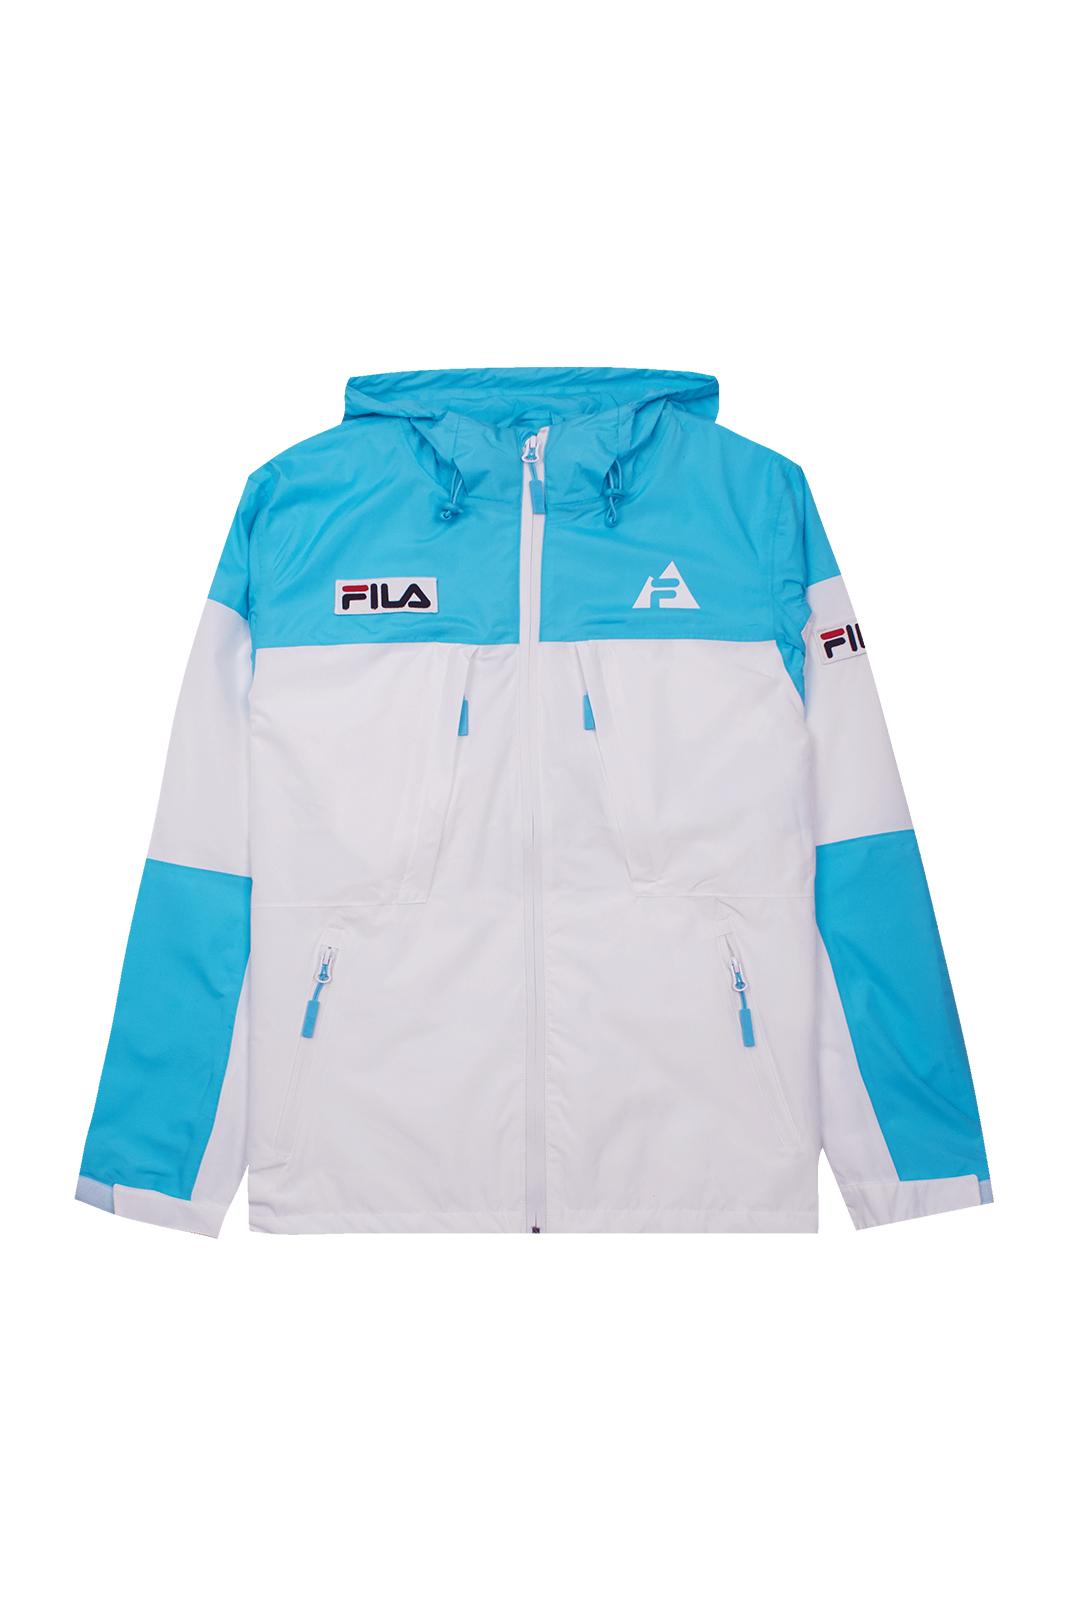 Blouson / doudoune  Fila 687122 HOLT SHELL A276 bright white-blue atoll